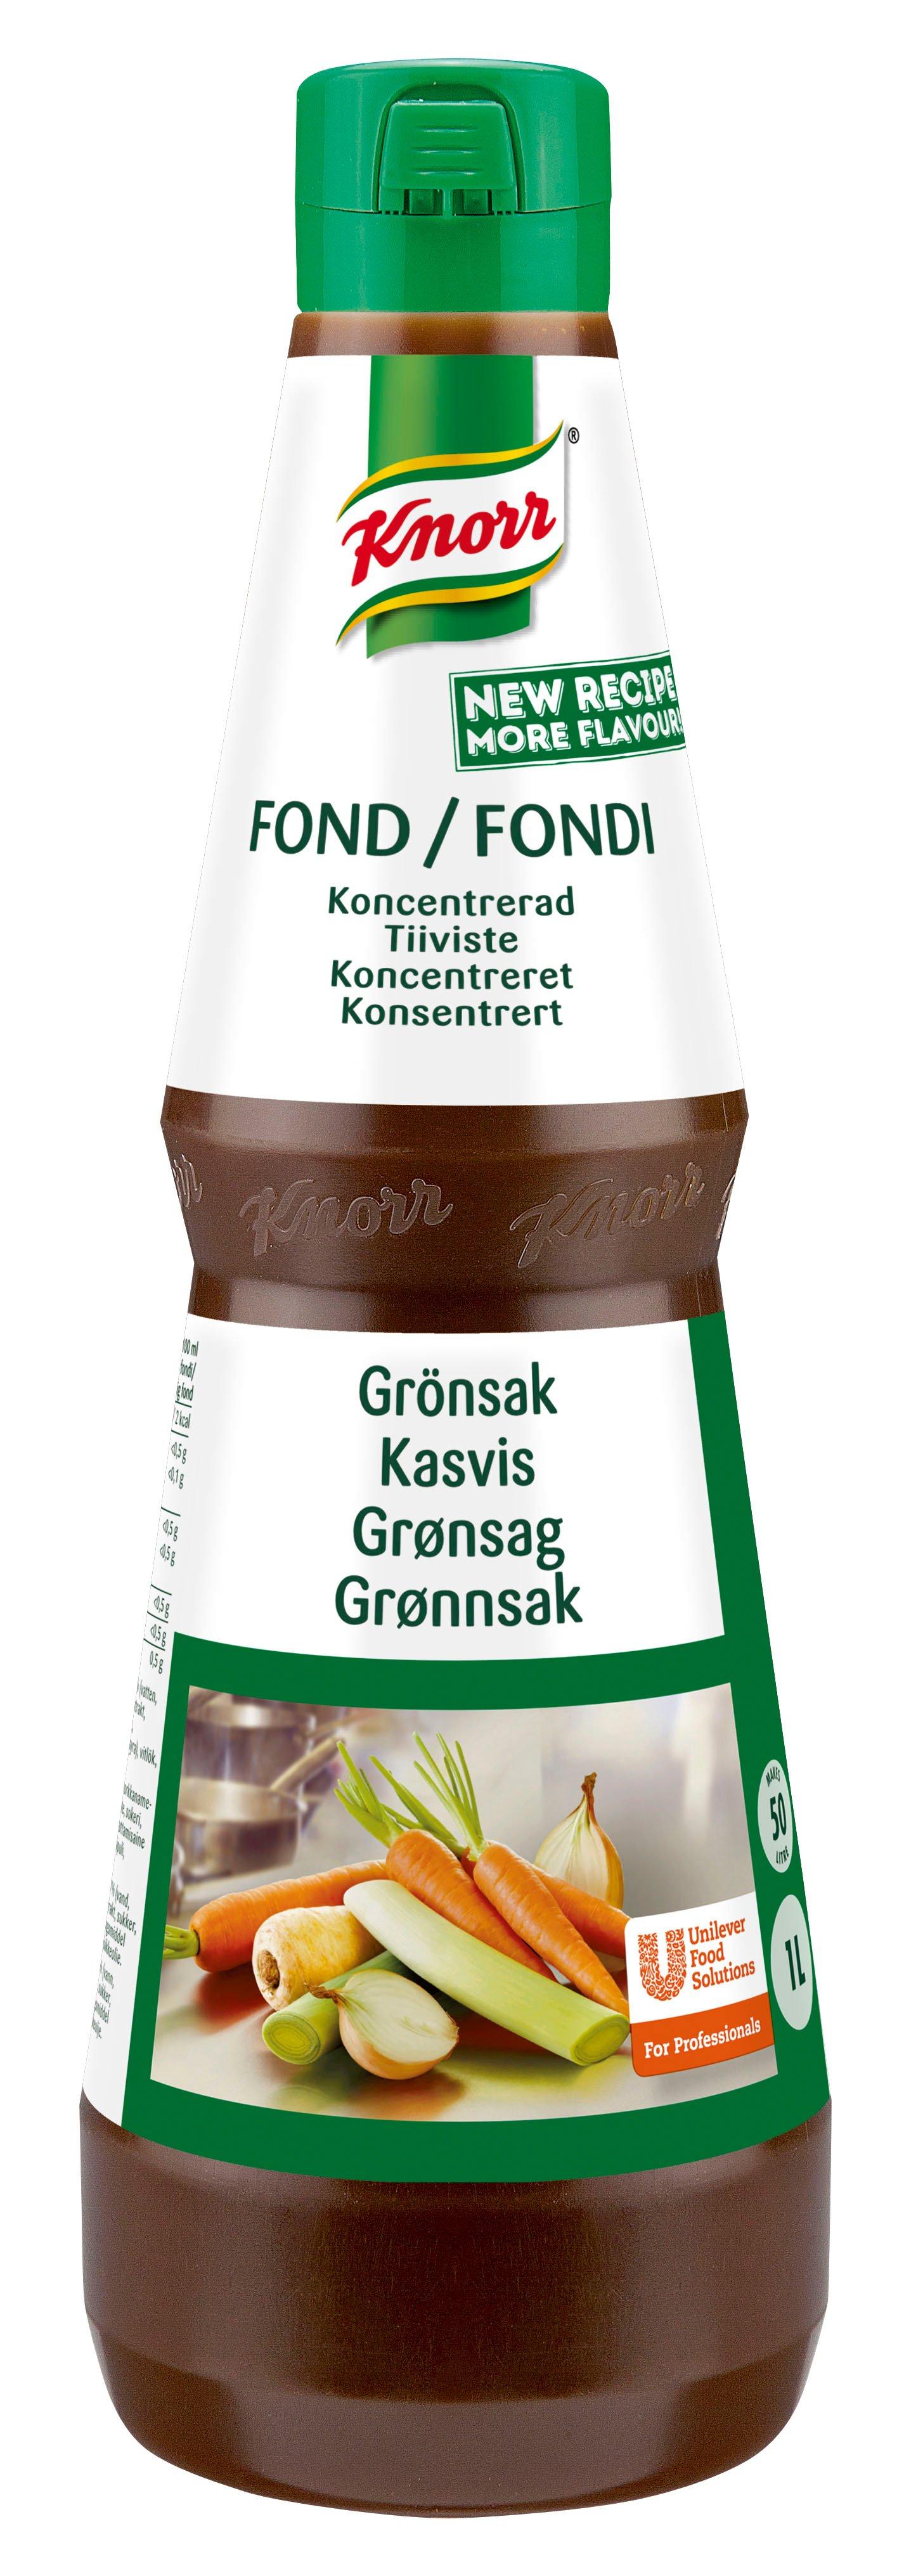 Knorr Grønnsaksfond konsentrat 50L